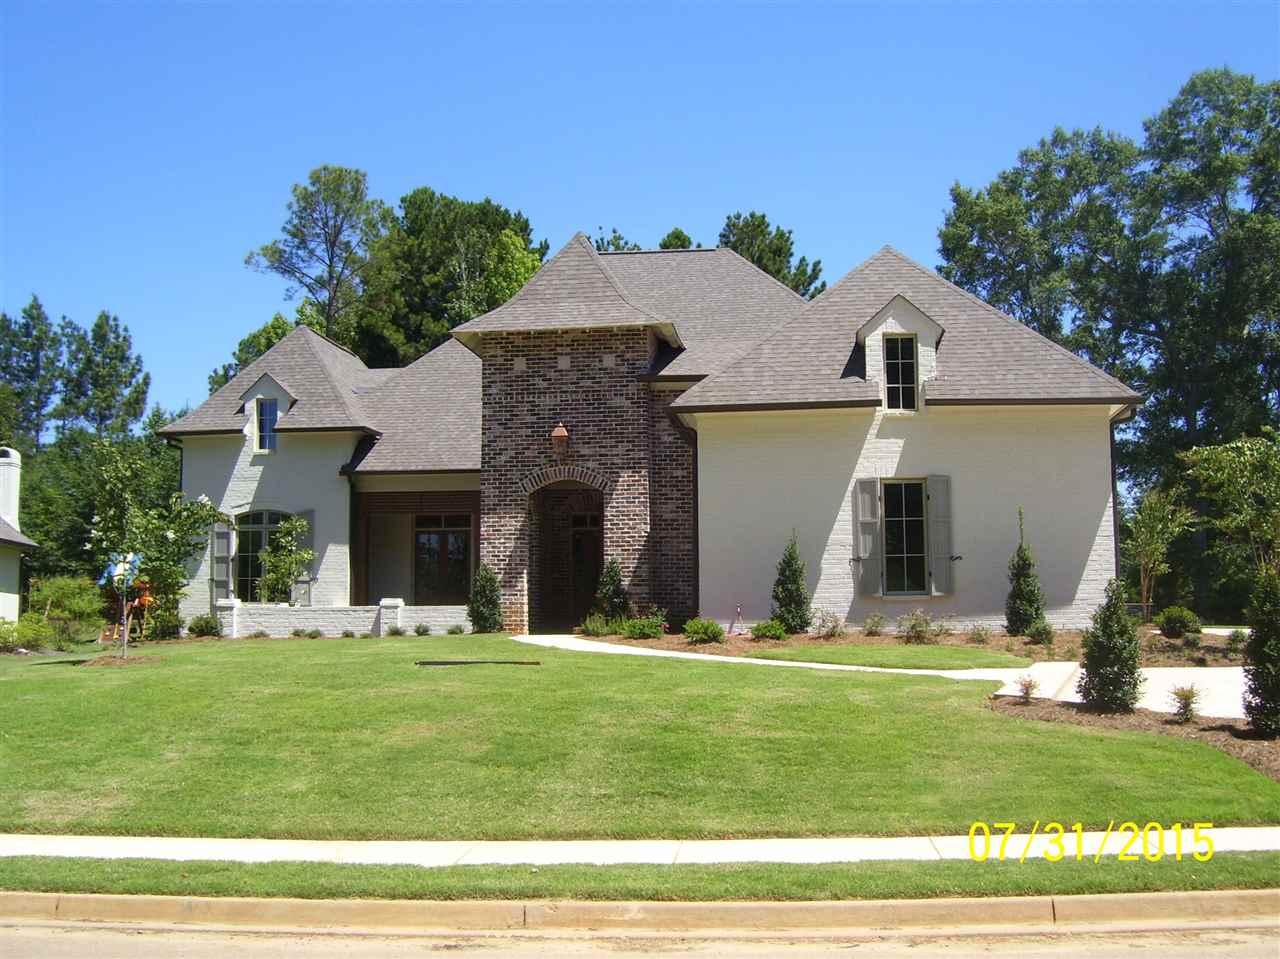 Real Estate for Sale, ListingId: 34053012, Ridgeland,MS39157